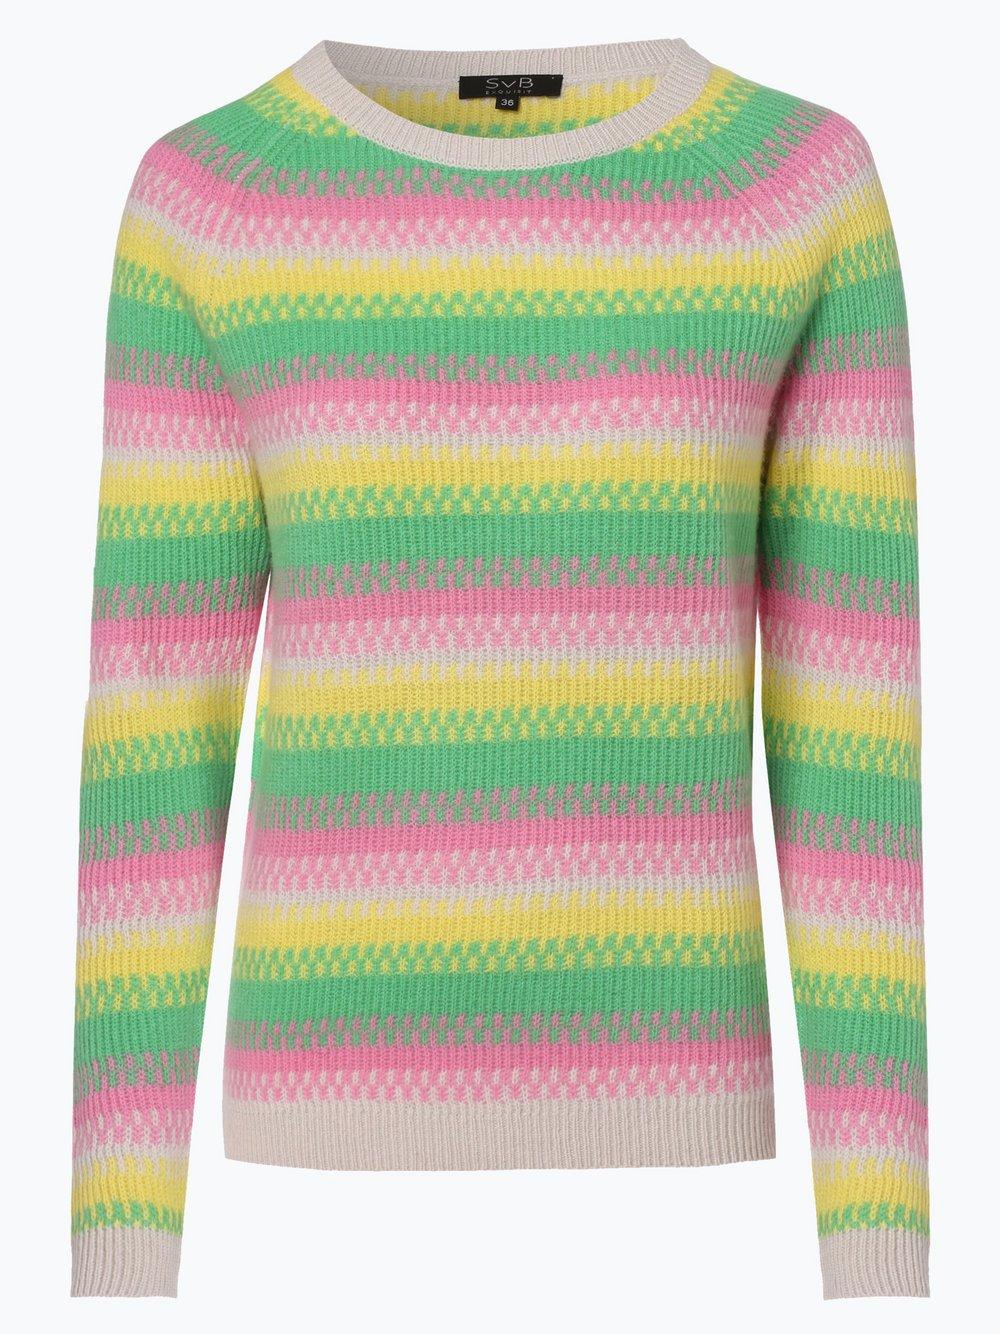 Trennschuhe 664ff bab89 Damen Pure Cashmere Pullover